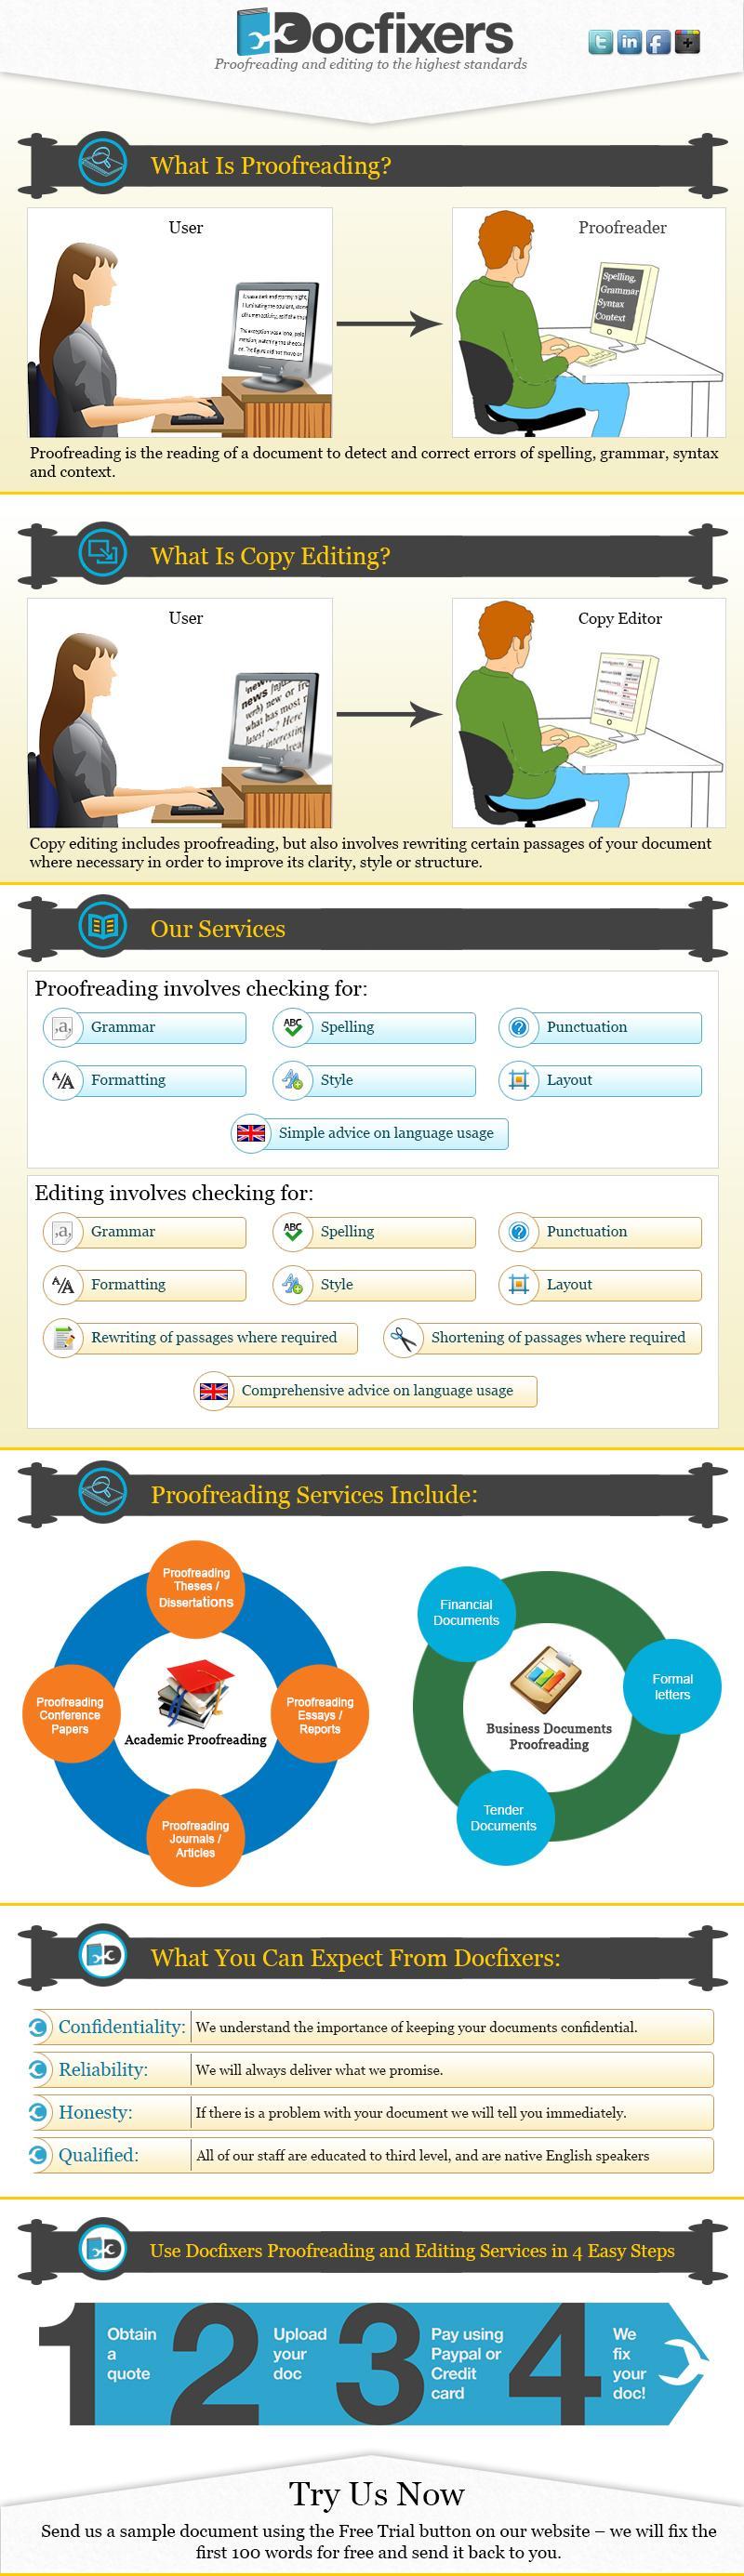 proofreading--proofreaders--uk_5213627b180e7